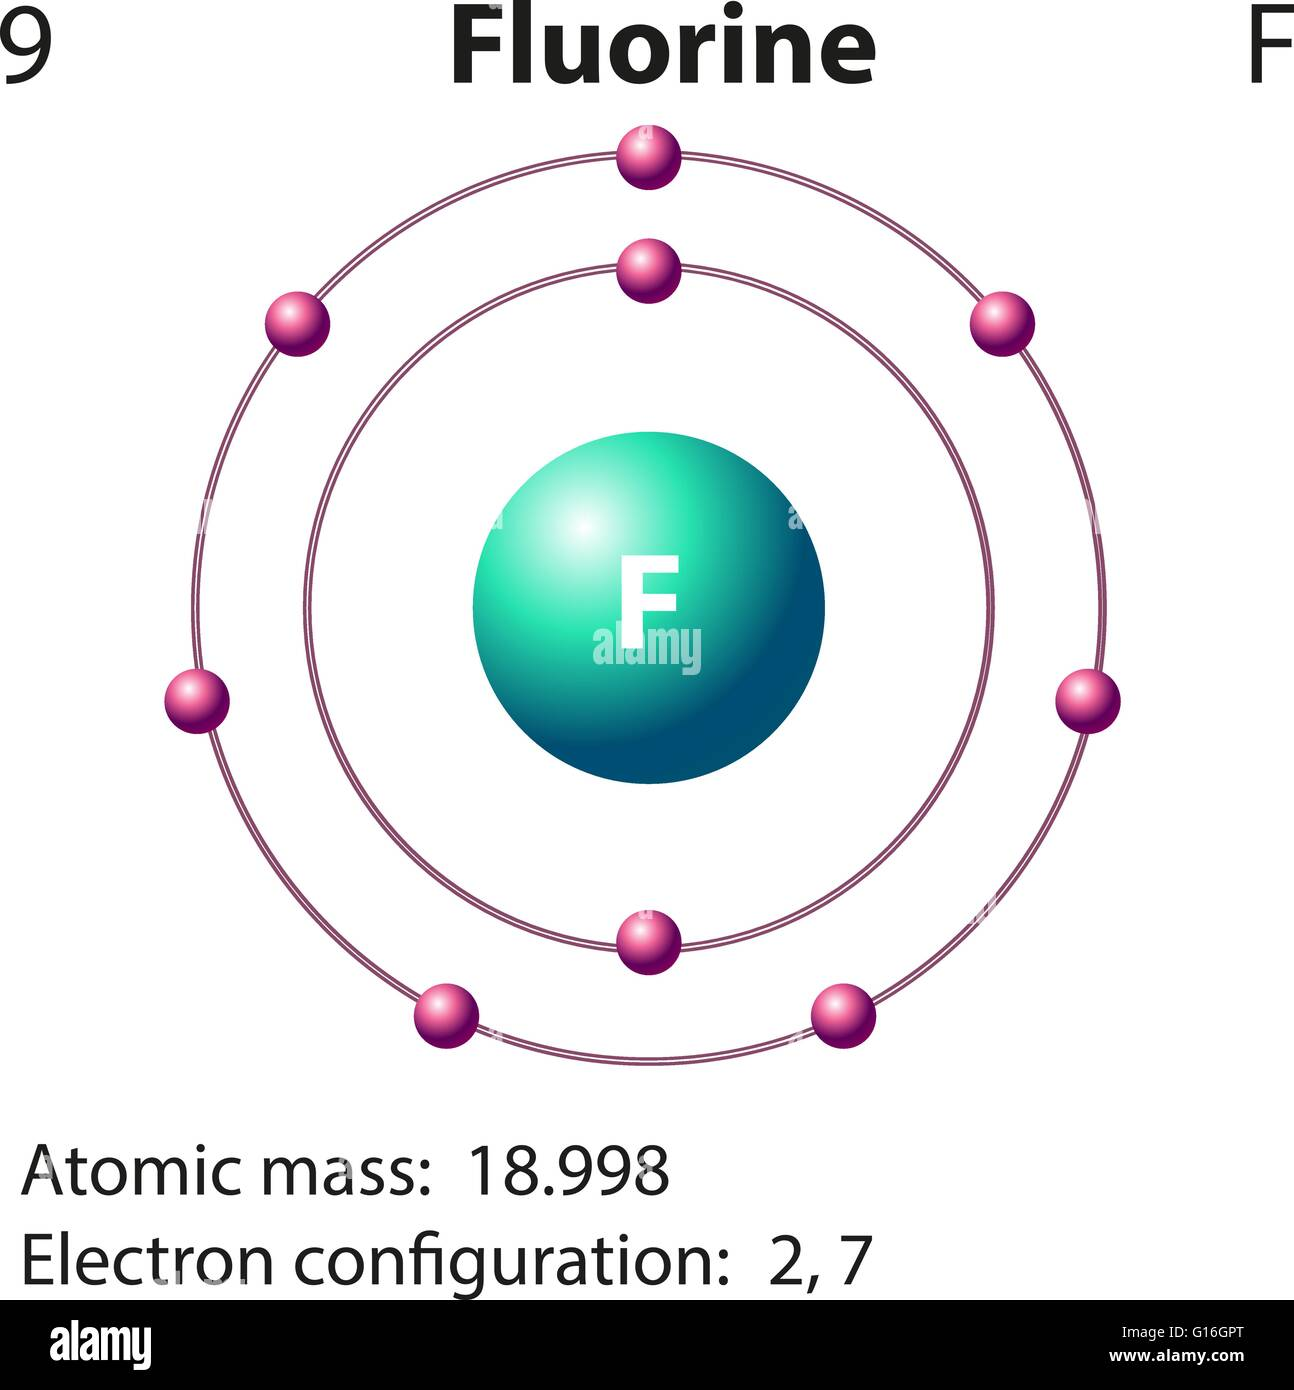 hight resolution of fluorine atom stock photos fluorine atom stock images alamy rh alamy com magnesium bohr model potassium bohr model